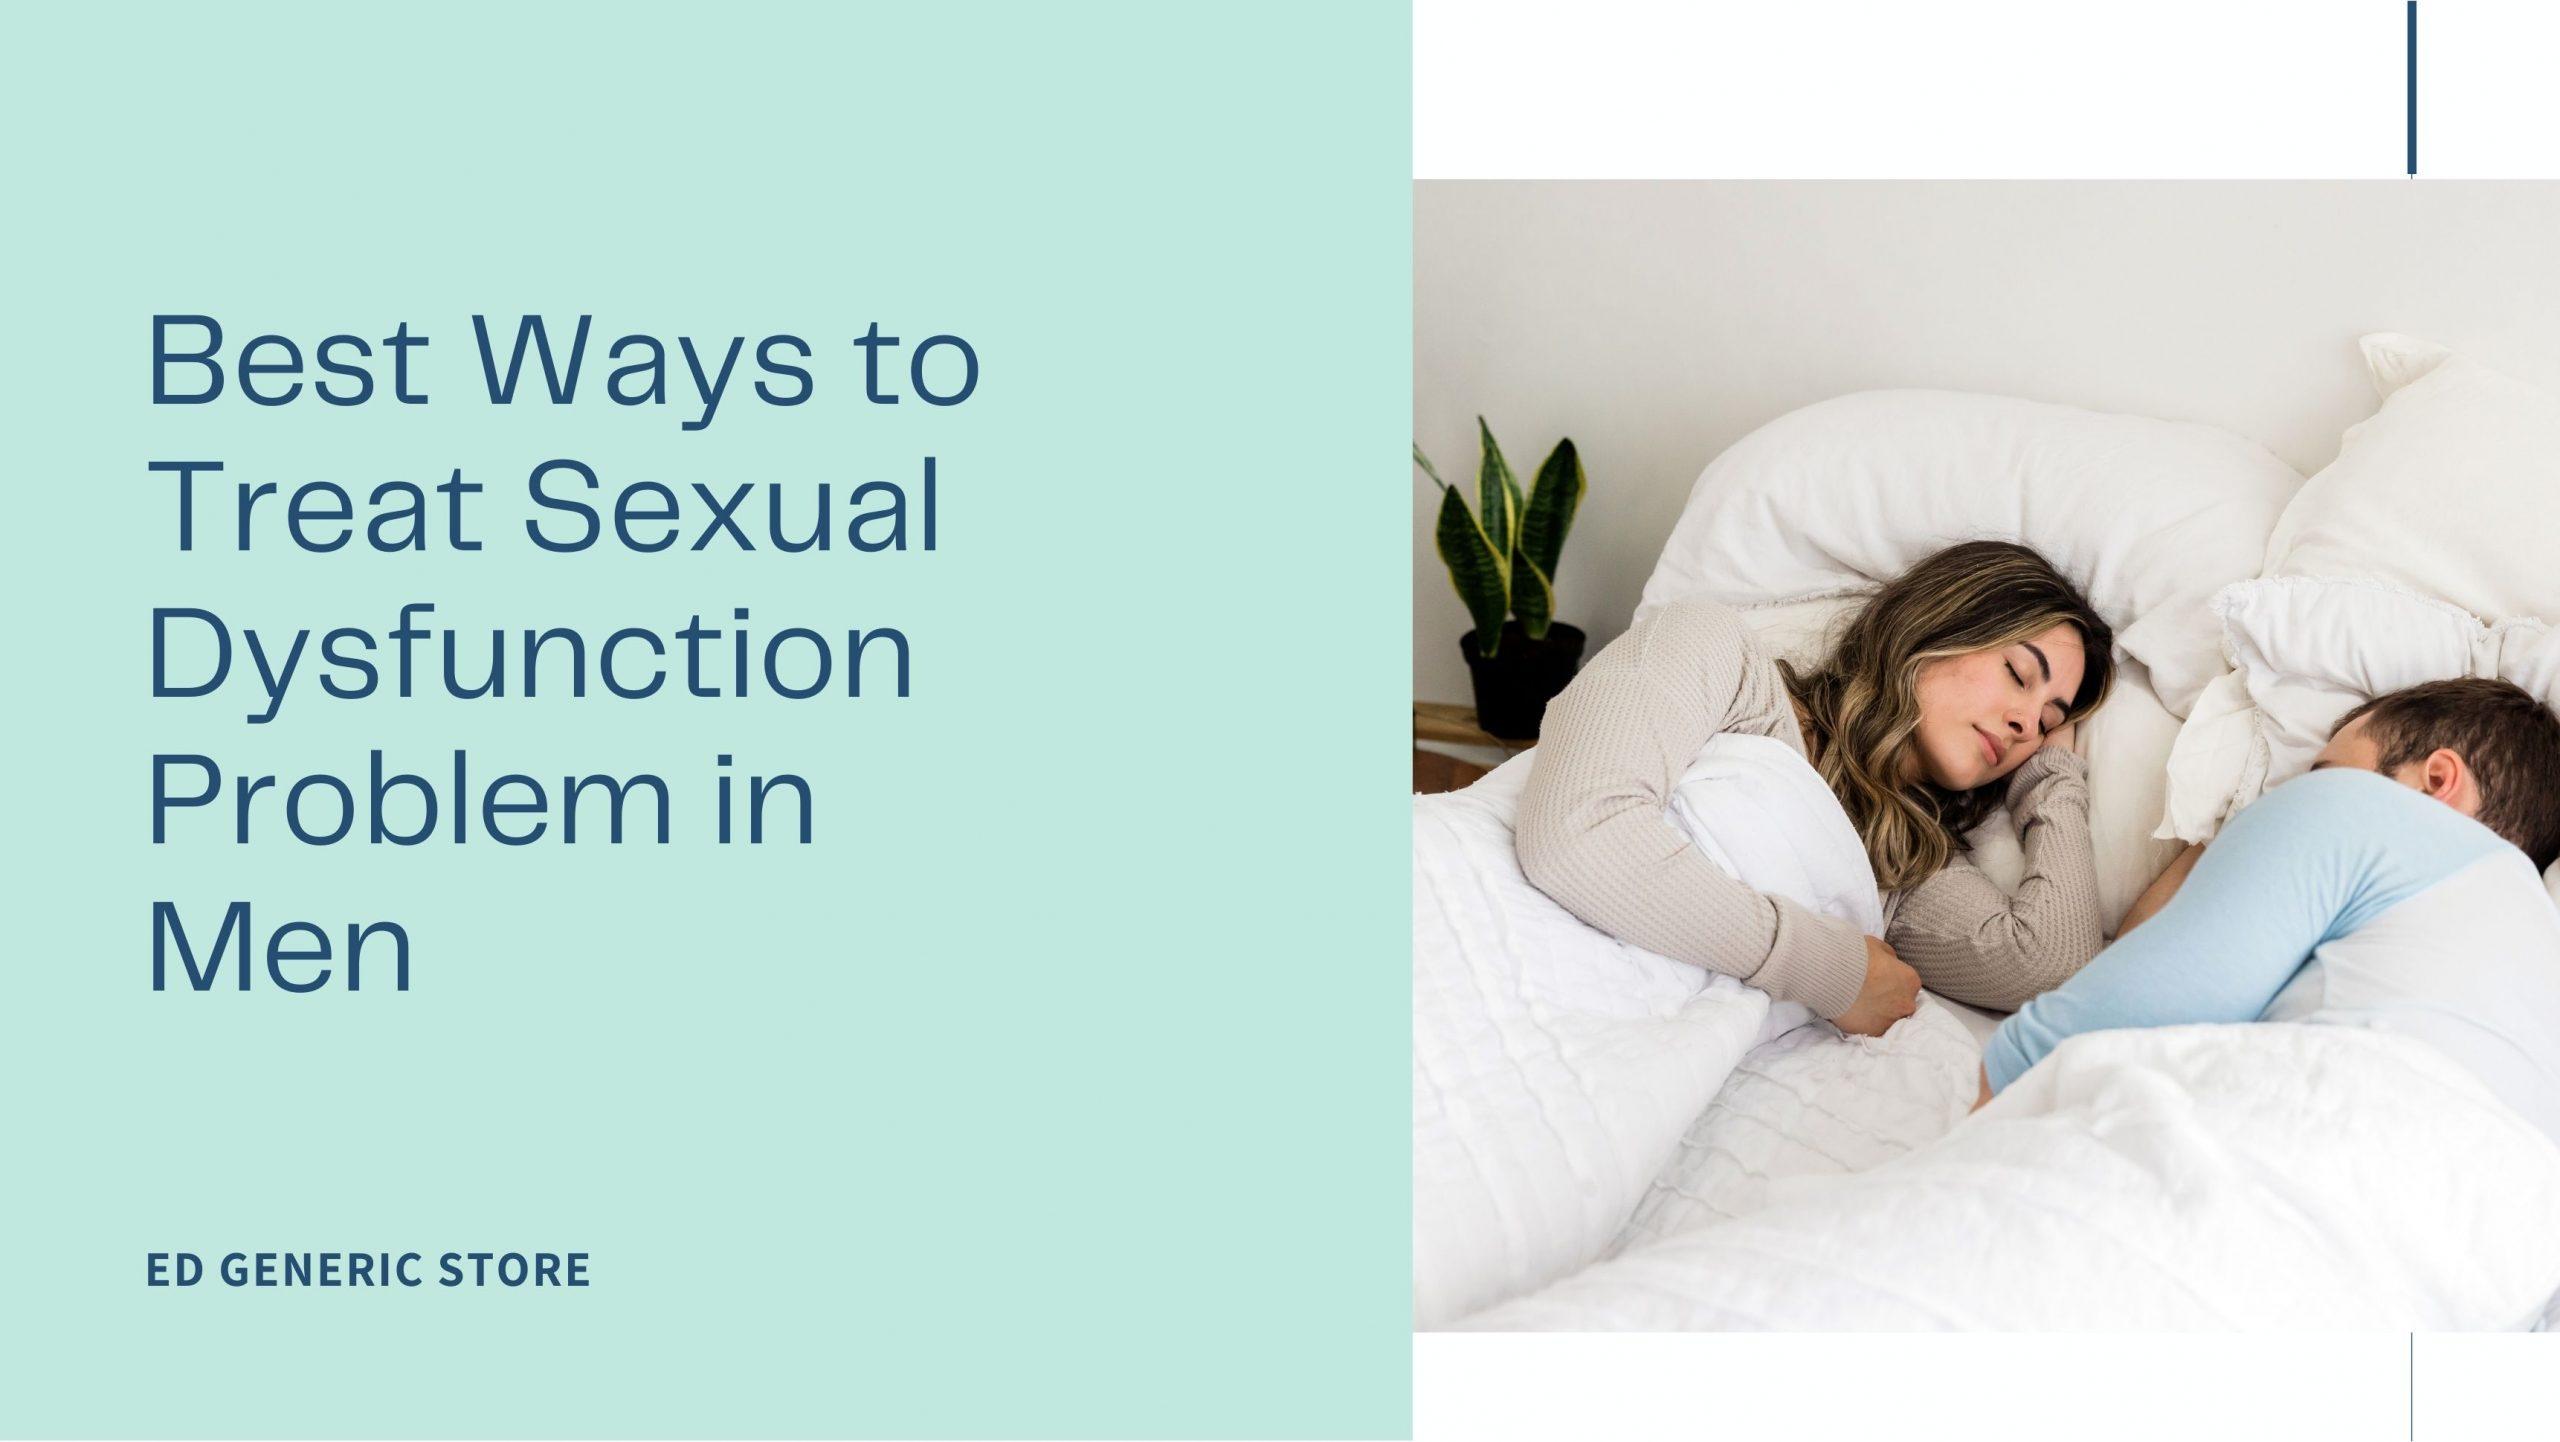 Best Ways to Treat Sexual Dysfunction Problem in Men